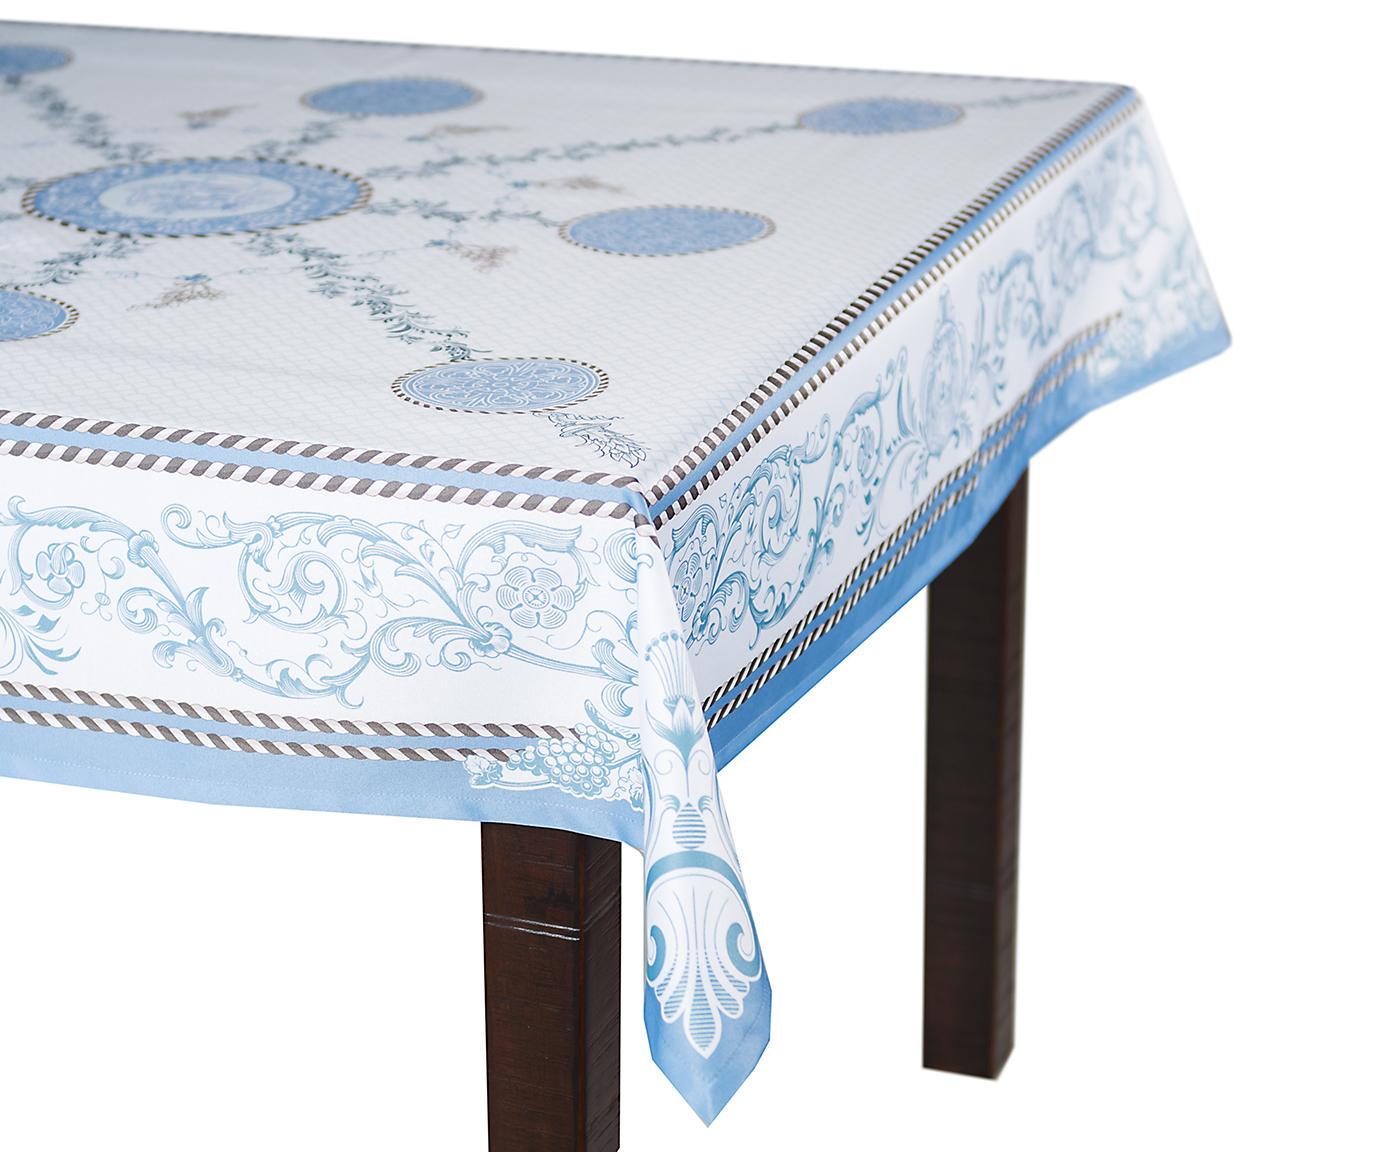 Кухня Скатерть 140x140 Blonder Home Laroux синяя skatert-140x140-blonder-home-laroux-sinyaya-ssha-rossiya.jpg